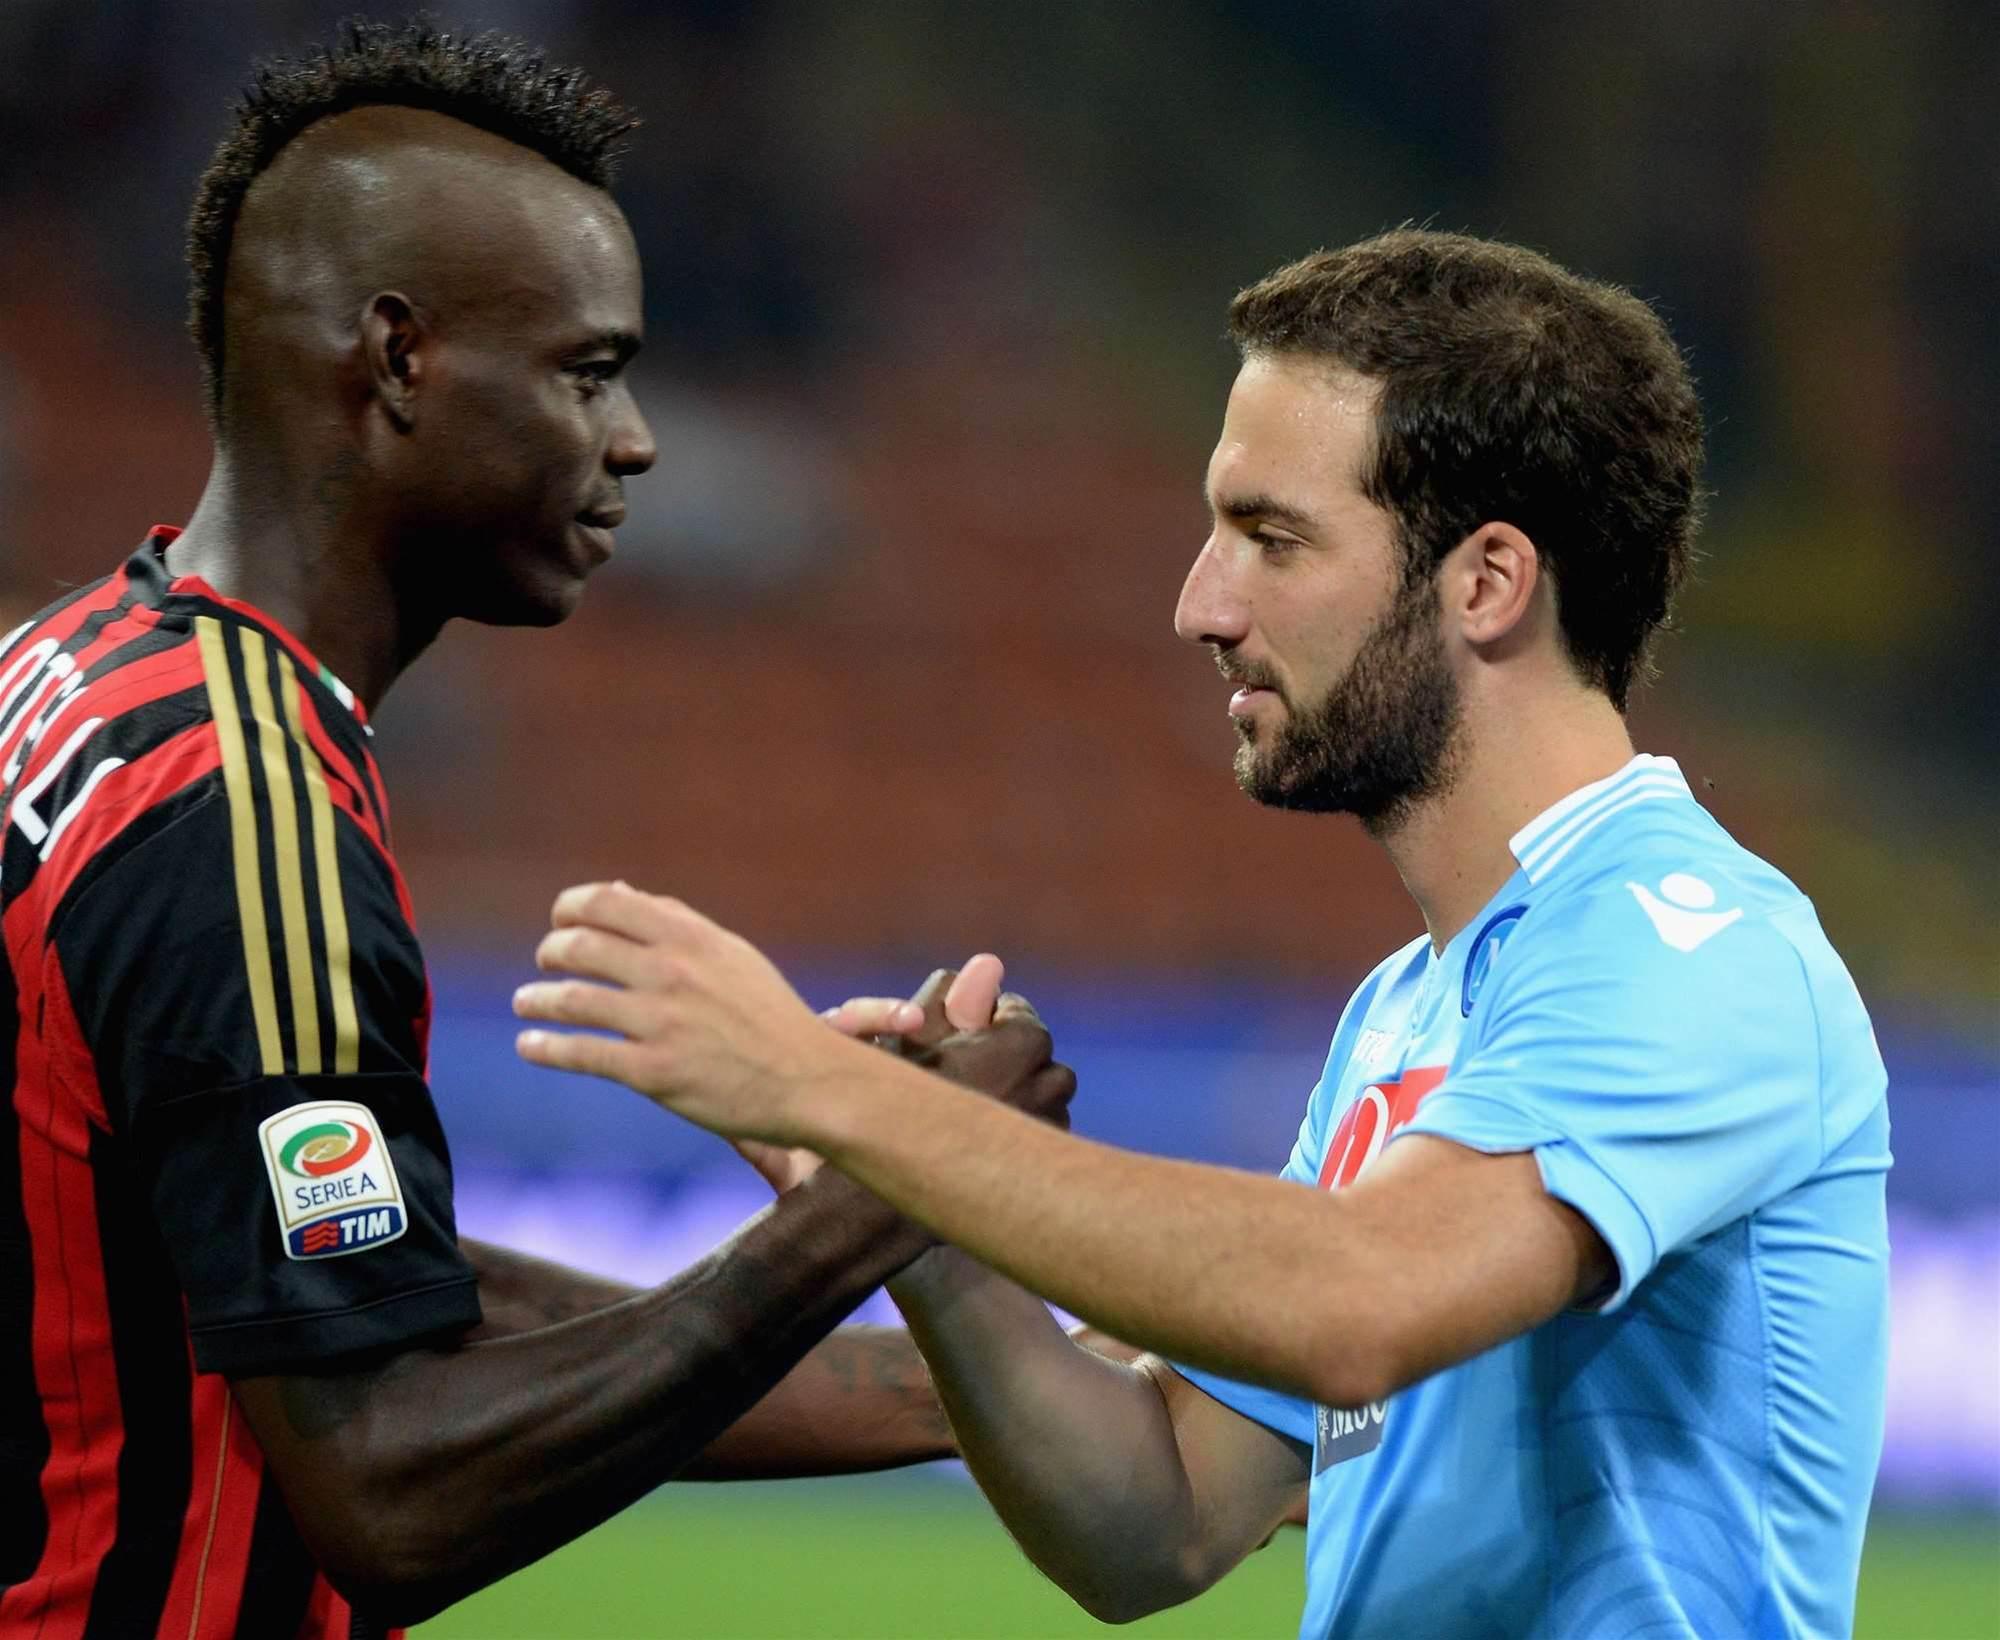 Serie A: Napoli, Roma lead as Inter hit seven